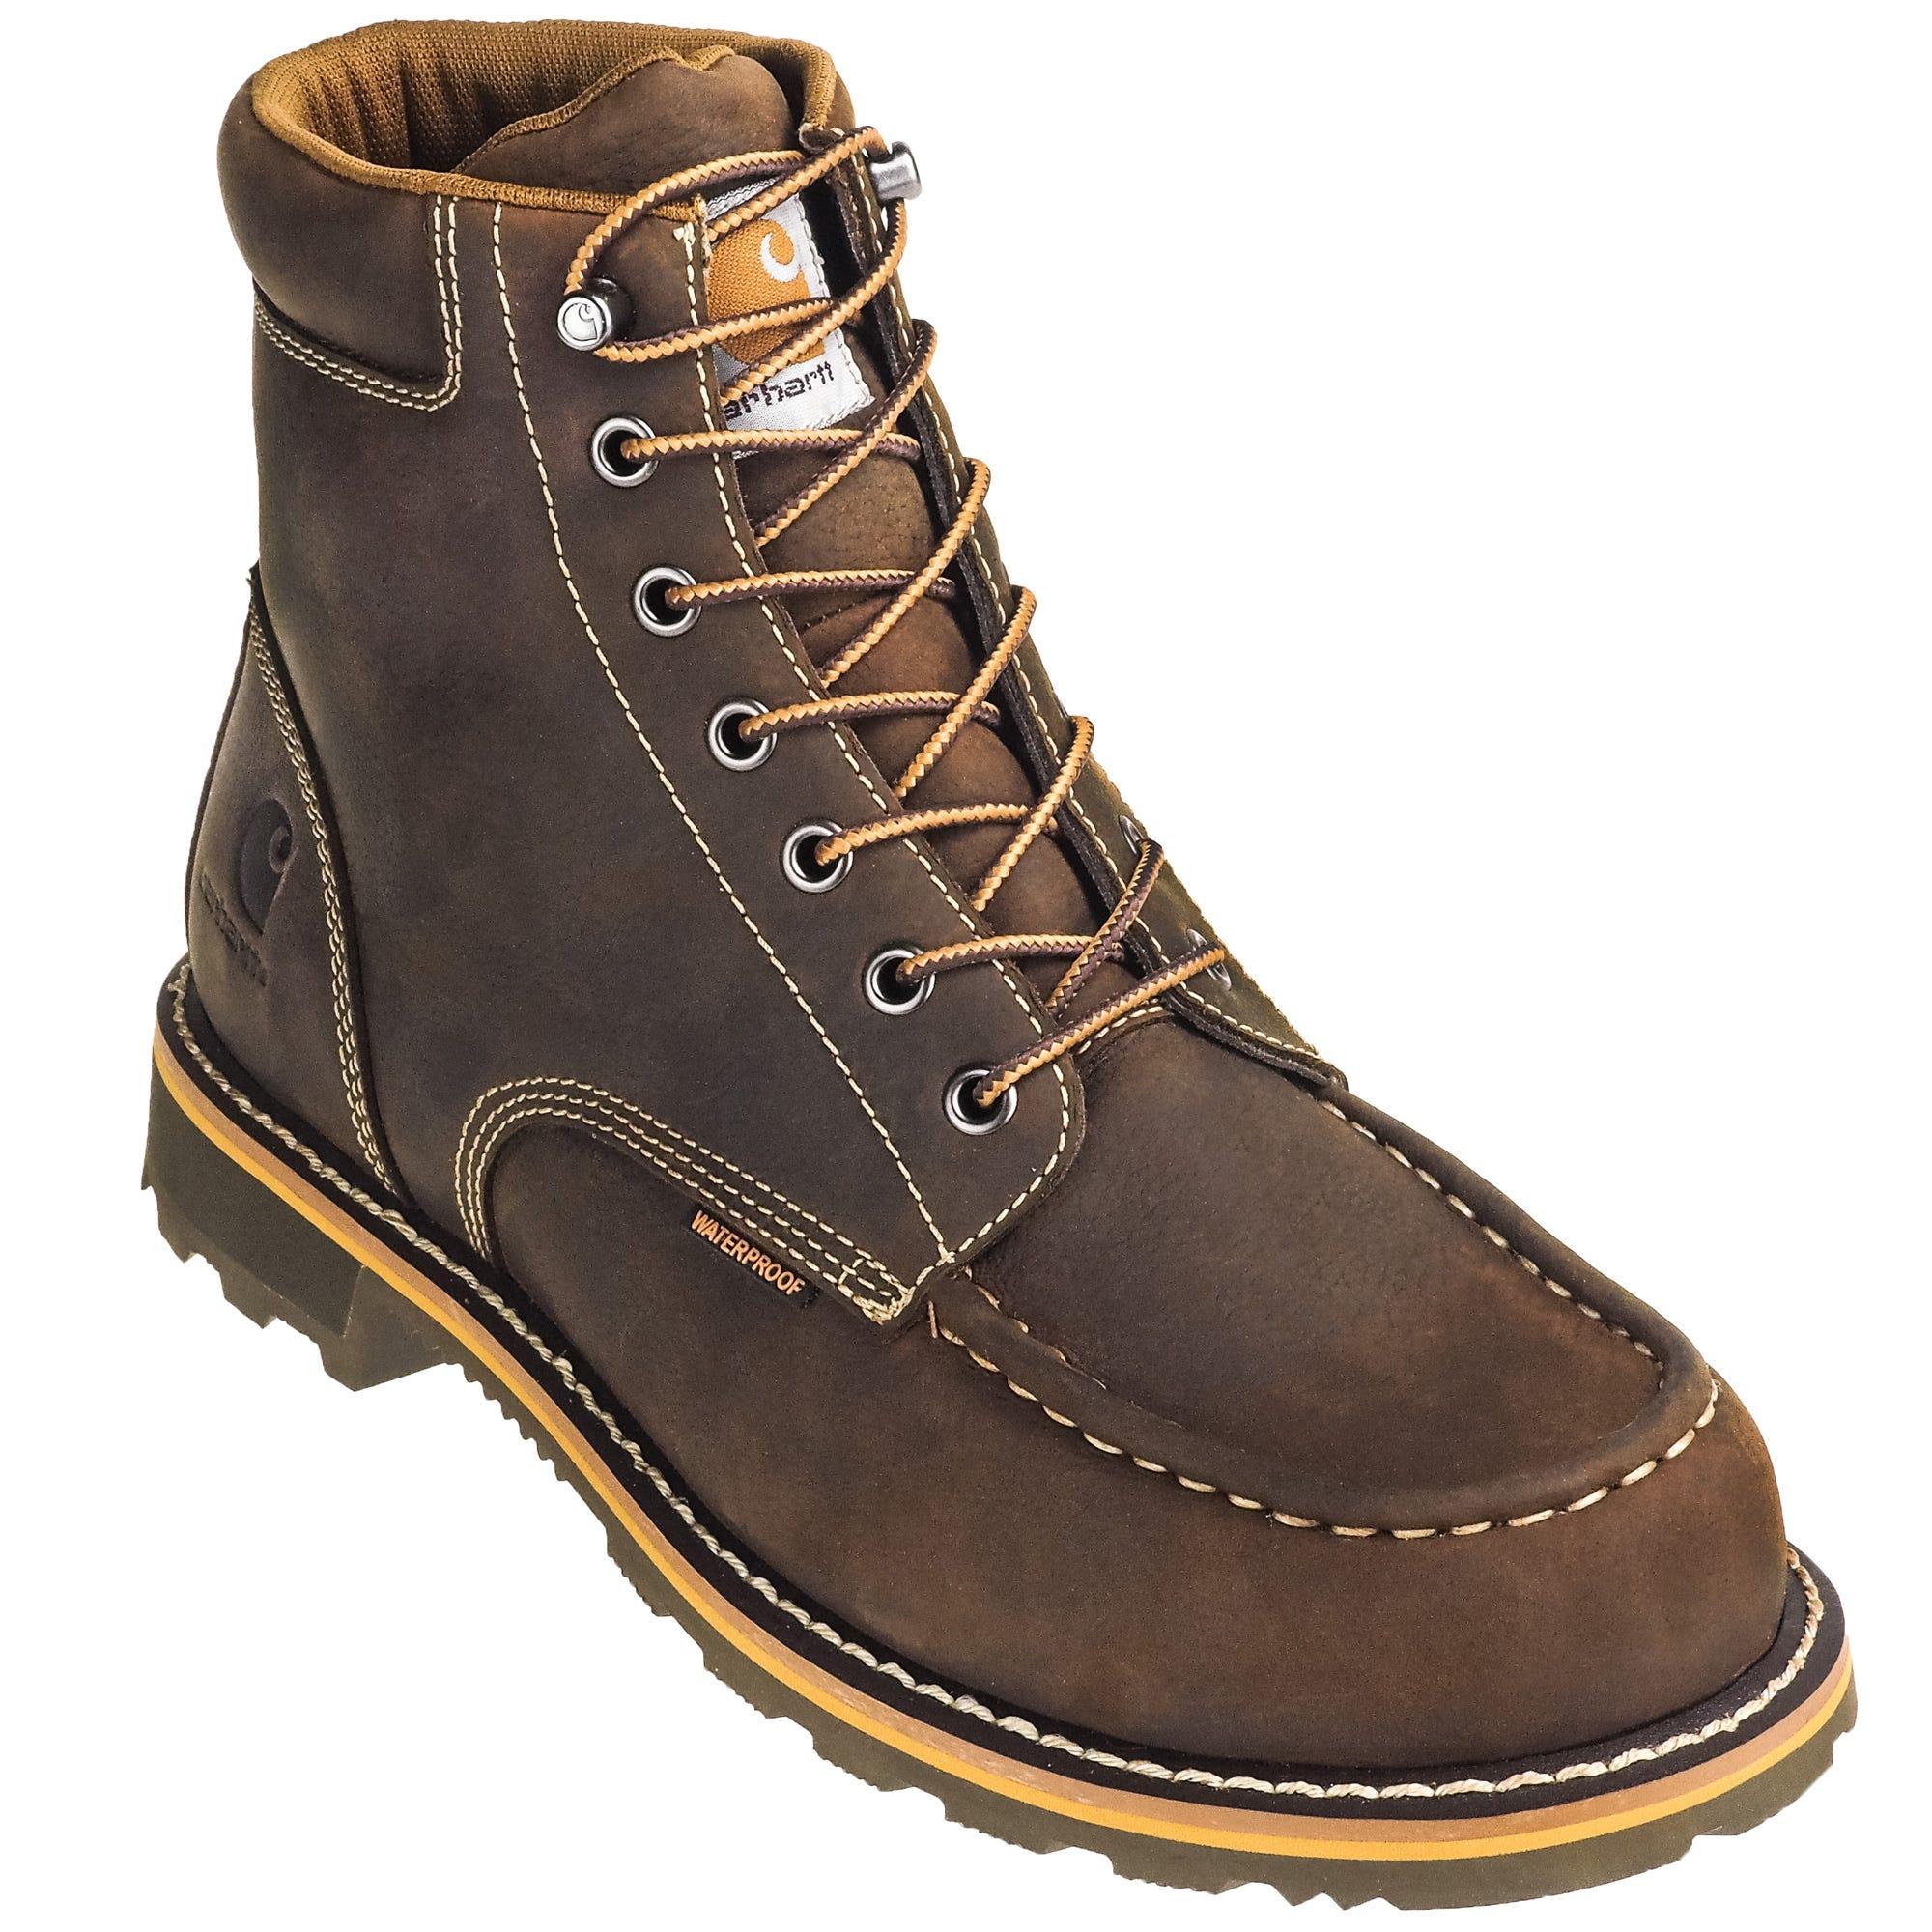 6122228ff1f Carhartt Boots: Waterproof Steel Toe CMW6297 Men's Brown 6-Inch EH ...